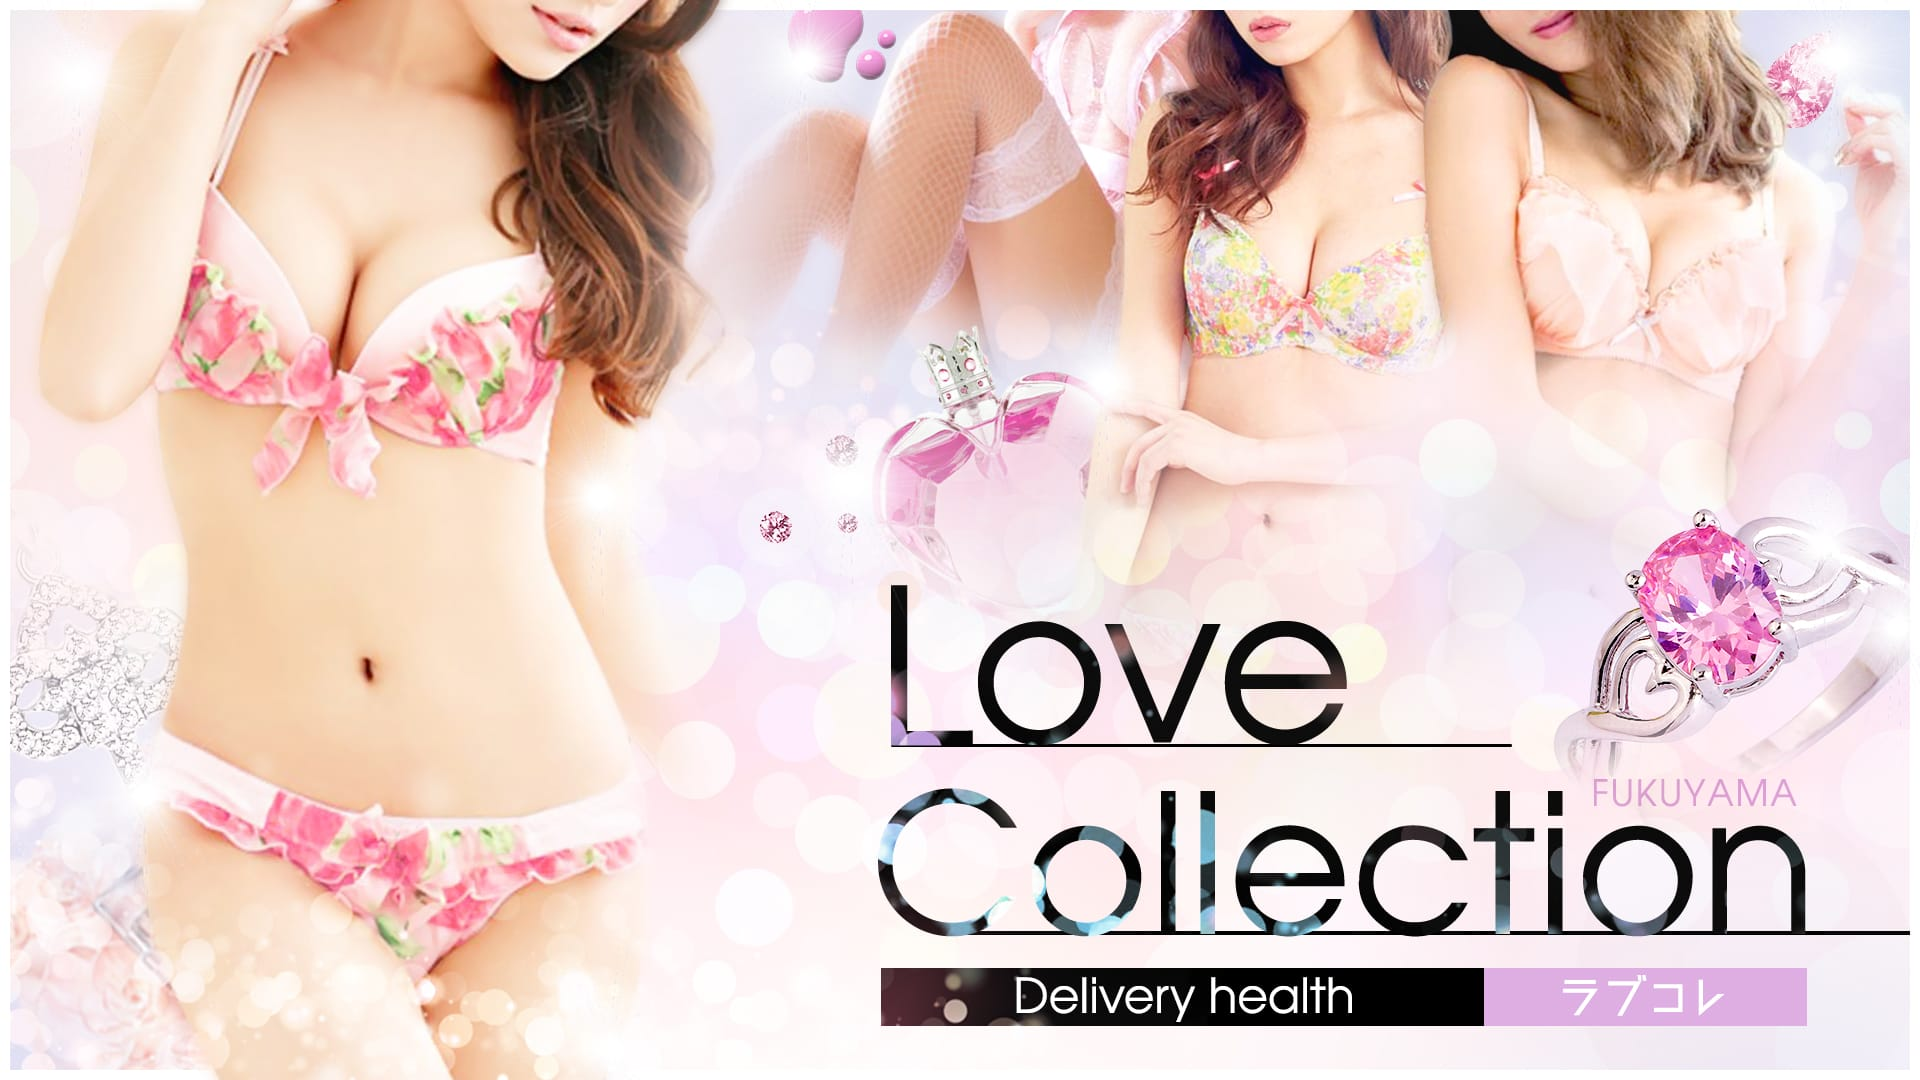 Fukuyama Love Collection-ラブコレ-